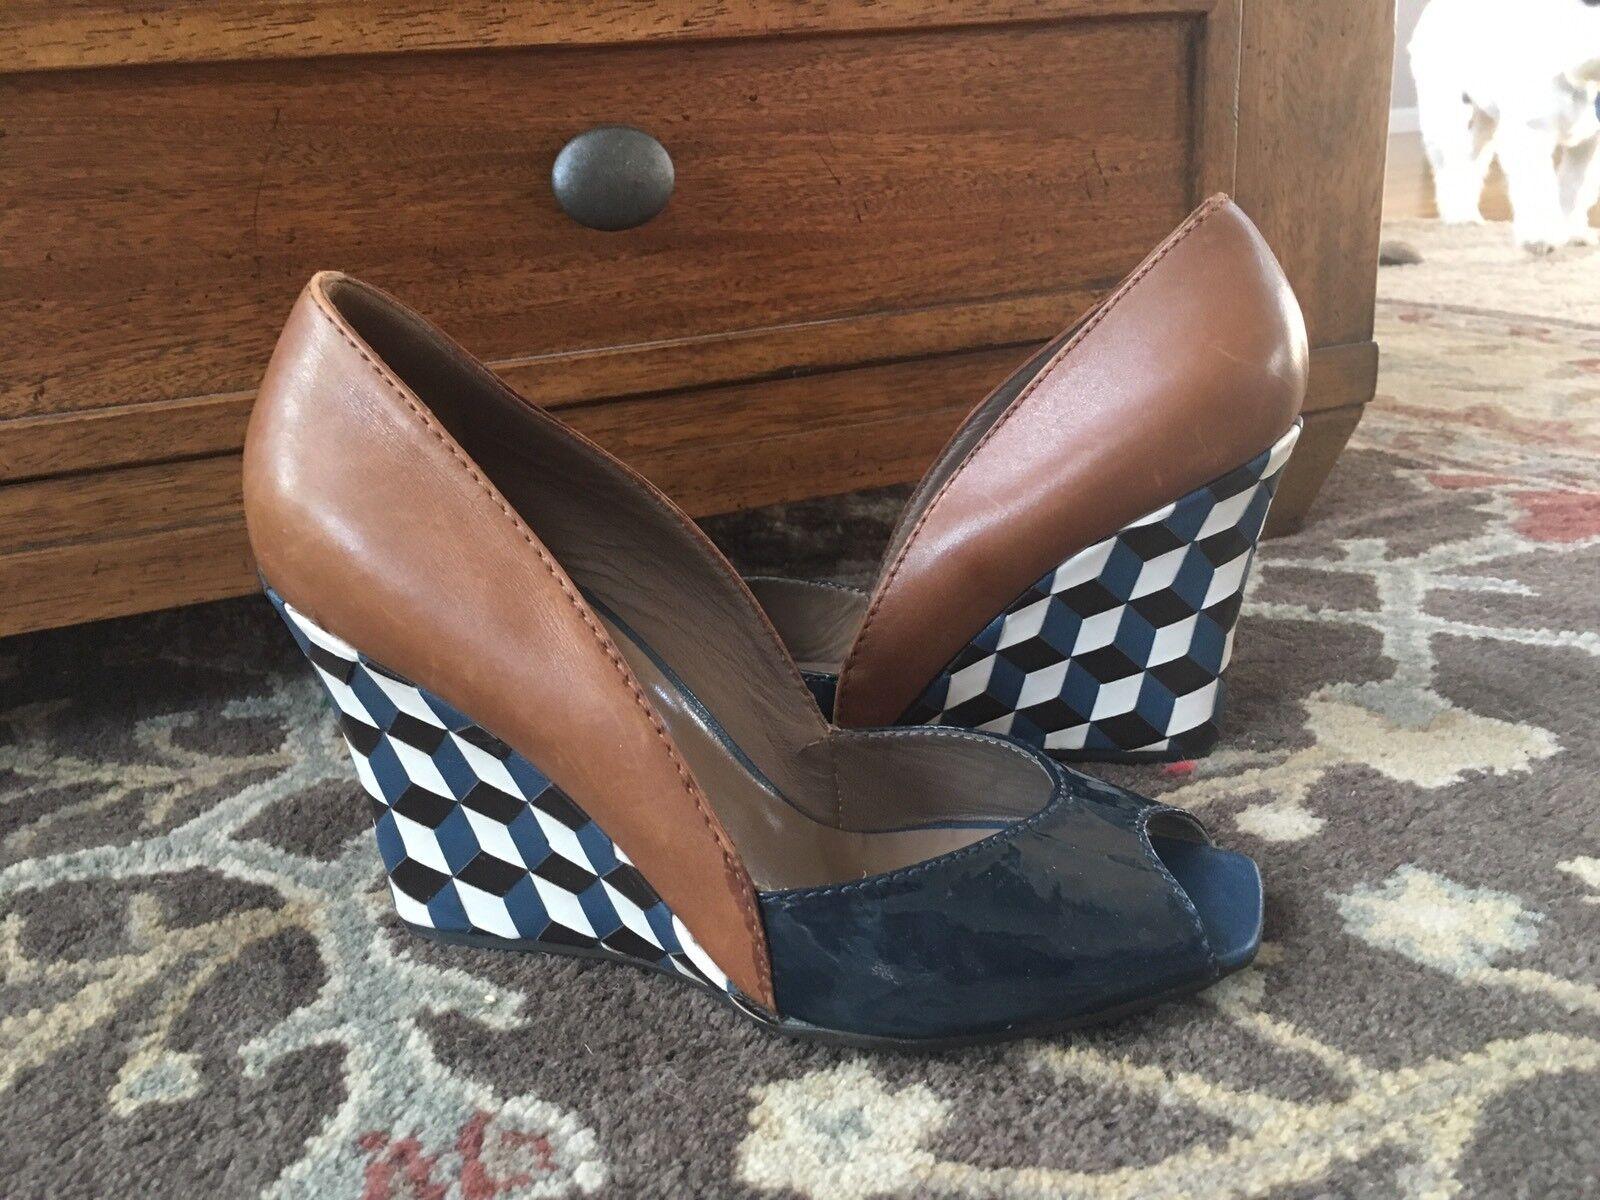 Dove Nuotano Gli Squali Size 38.5 Wedge Heel Shoes Blue Tan Checker Approx 8.5